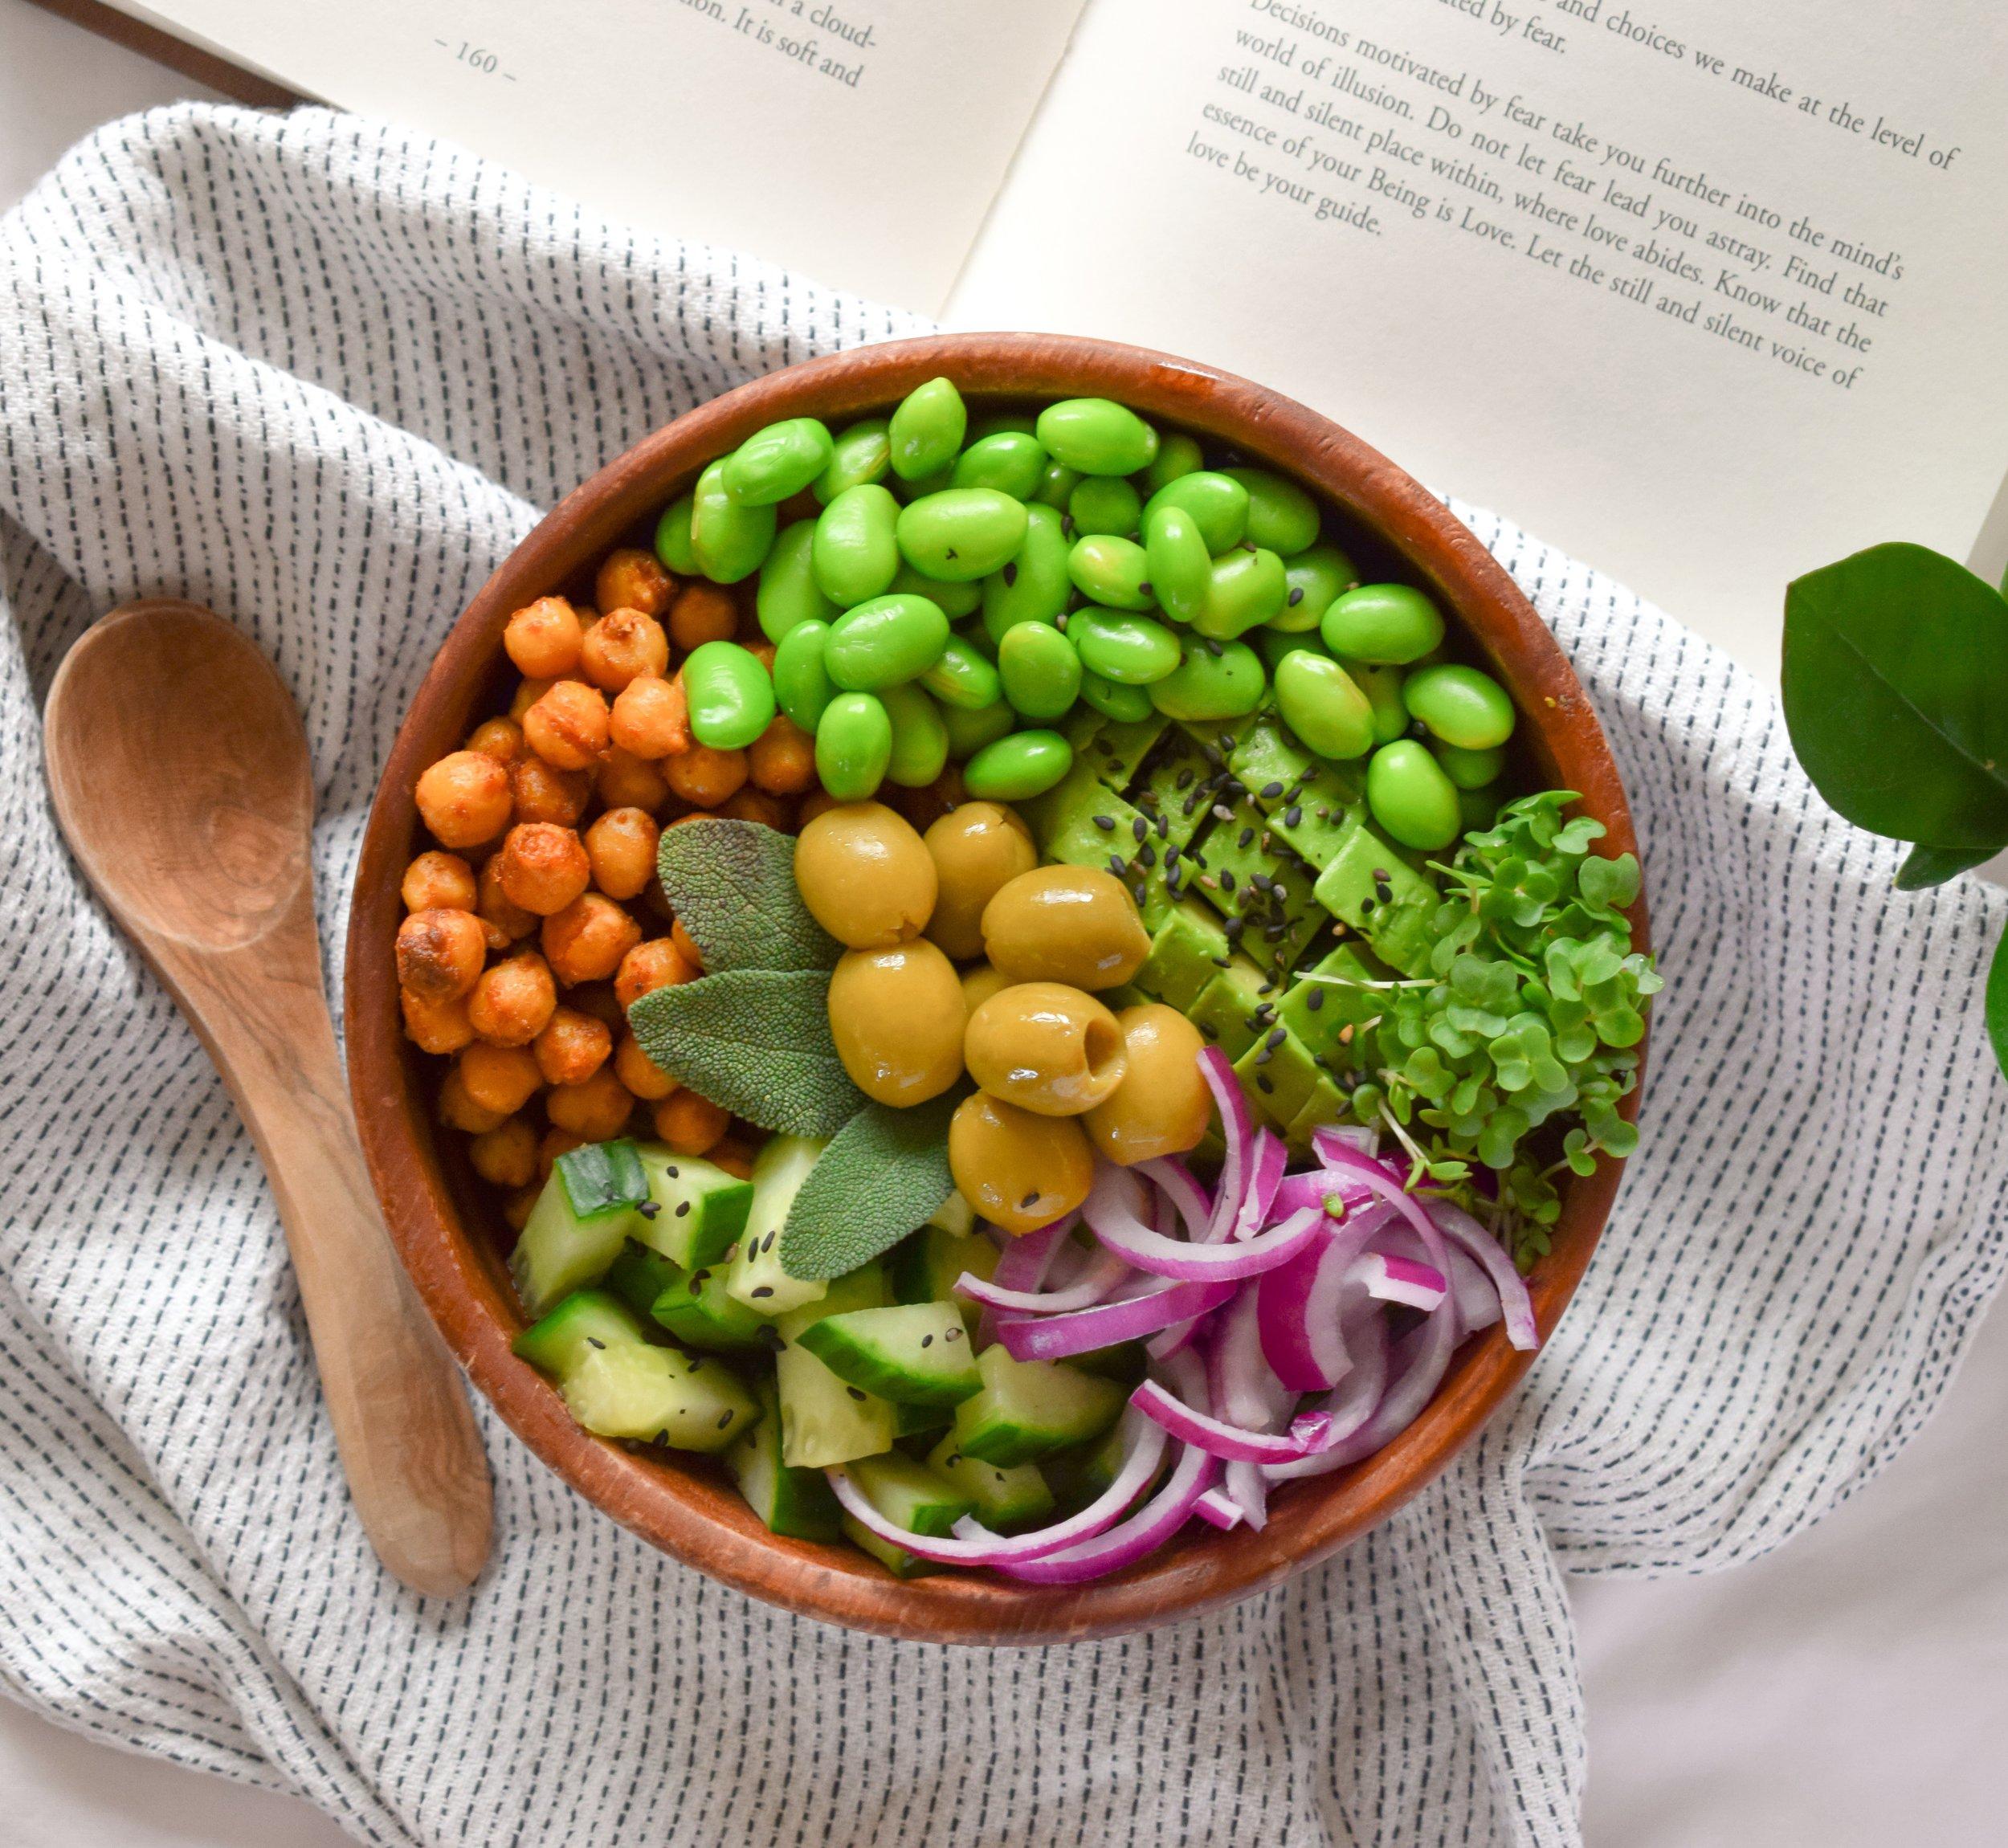 Vegan Roasted Chickpeas Buddha Bowl - Ally The Earthling